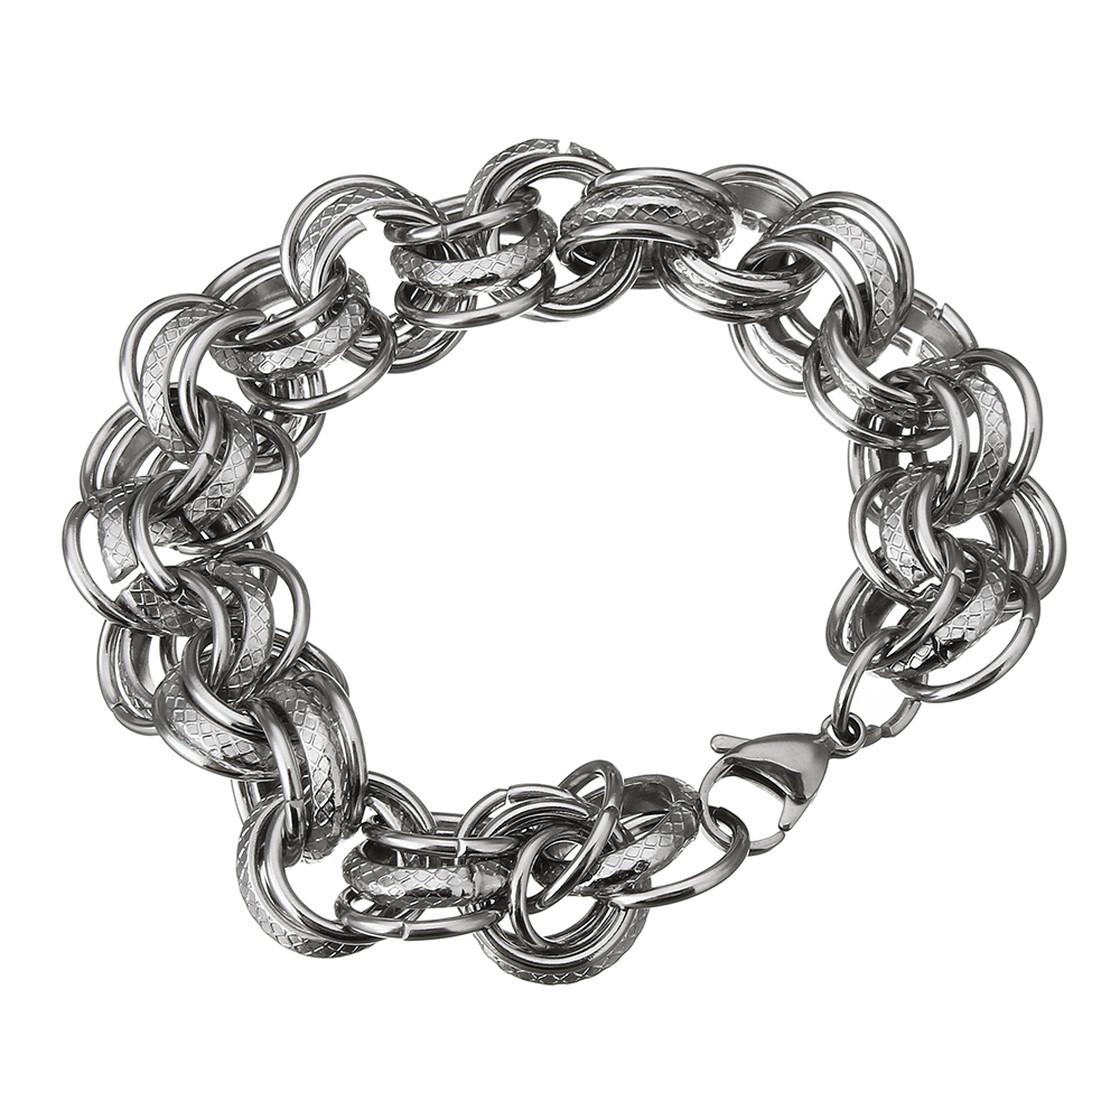 Armband, Edelstahl, Silberfarben, Design ?Fantasy?, Damen